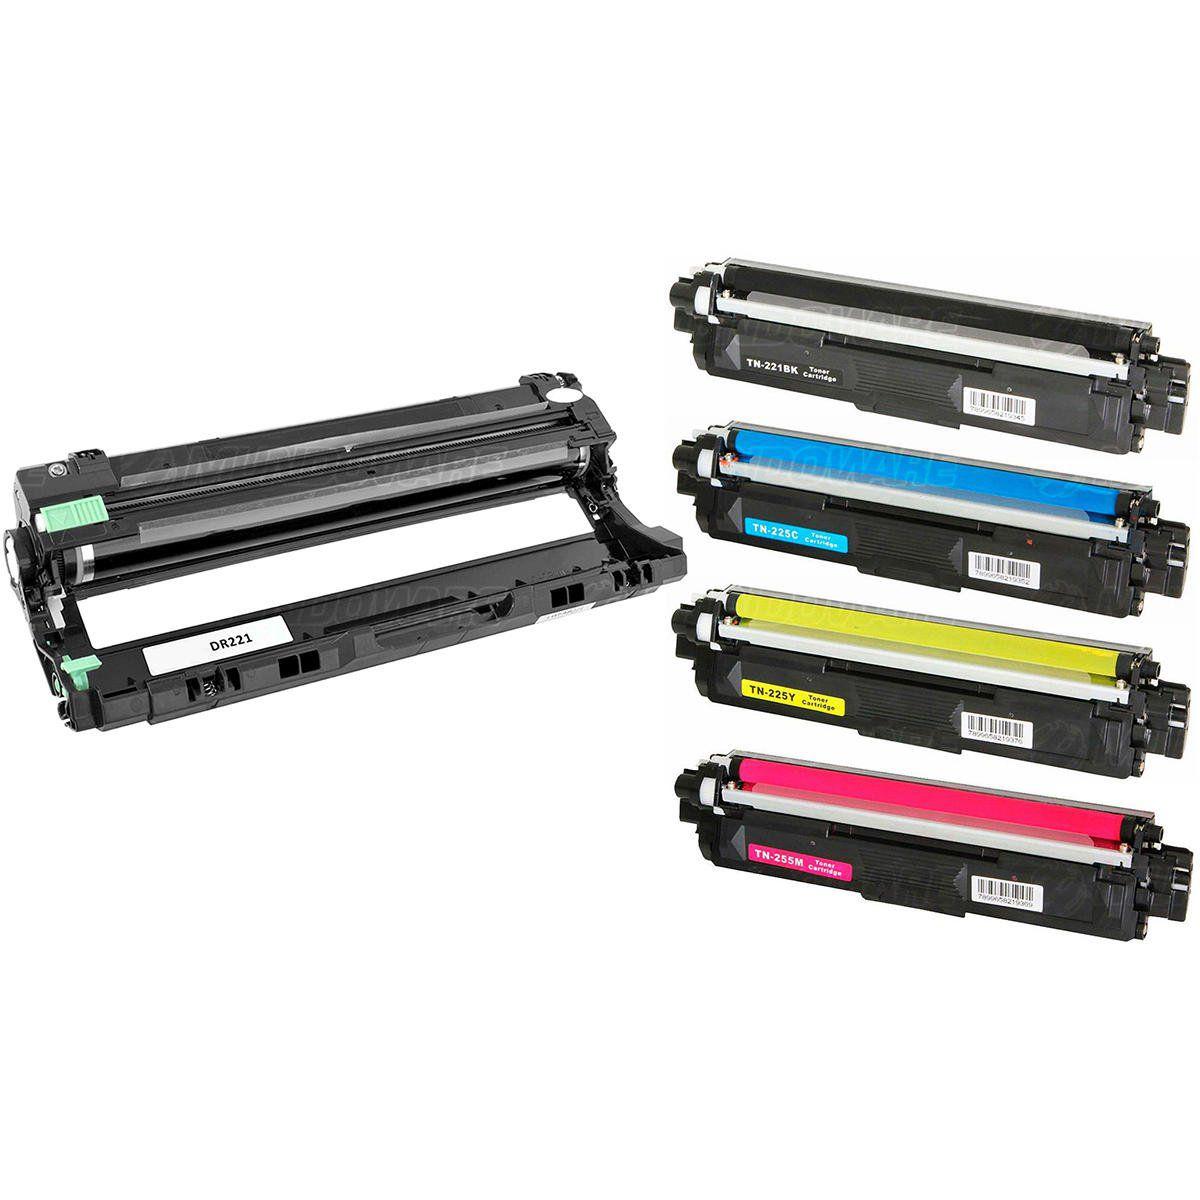 Compatível: Combo Fotocondutor DR221 + Kit Colorido de Toner TN221/225 para Brother HL-3140 HL-3150 3170 DCP-9020 9055